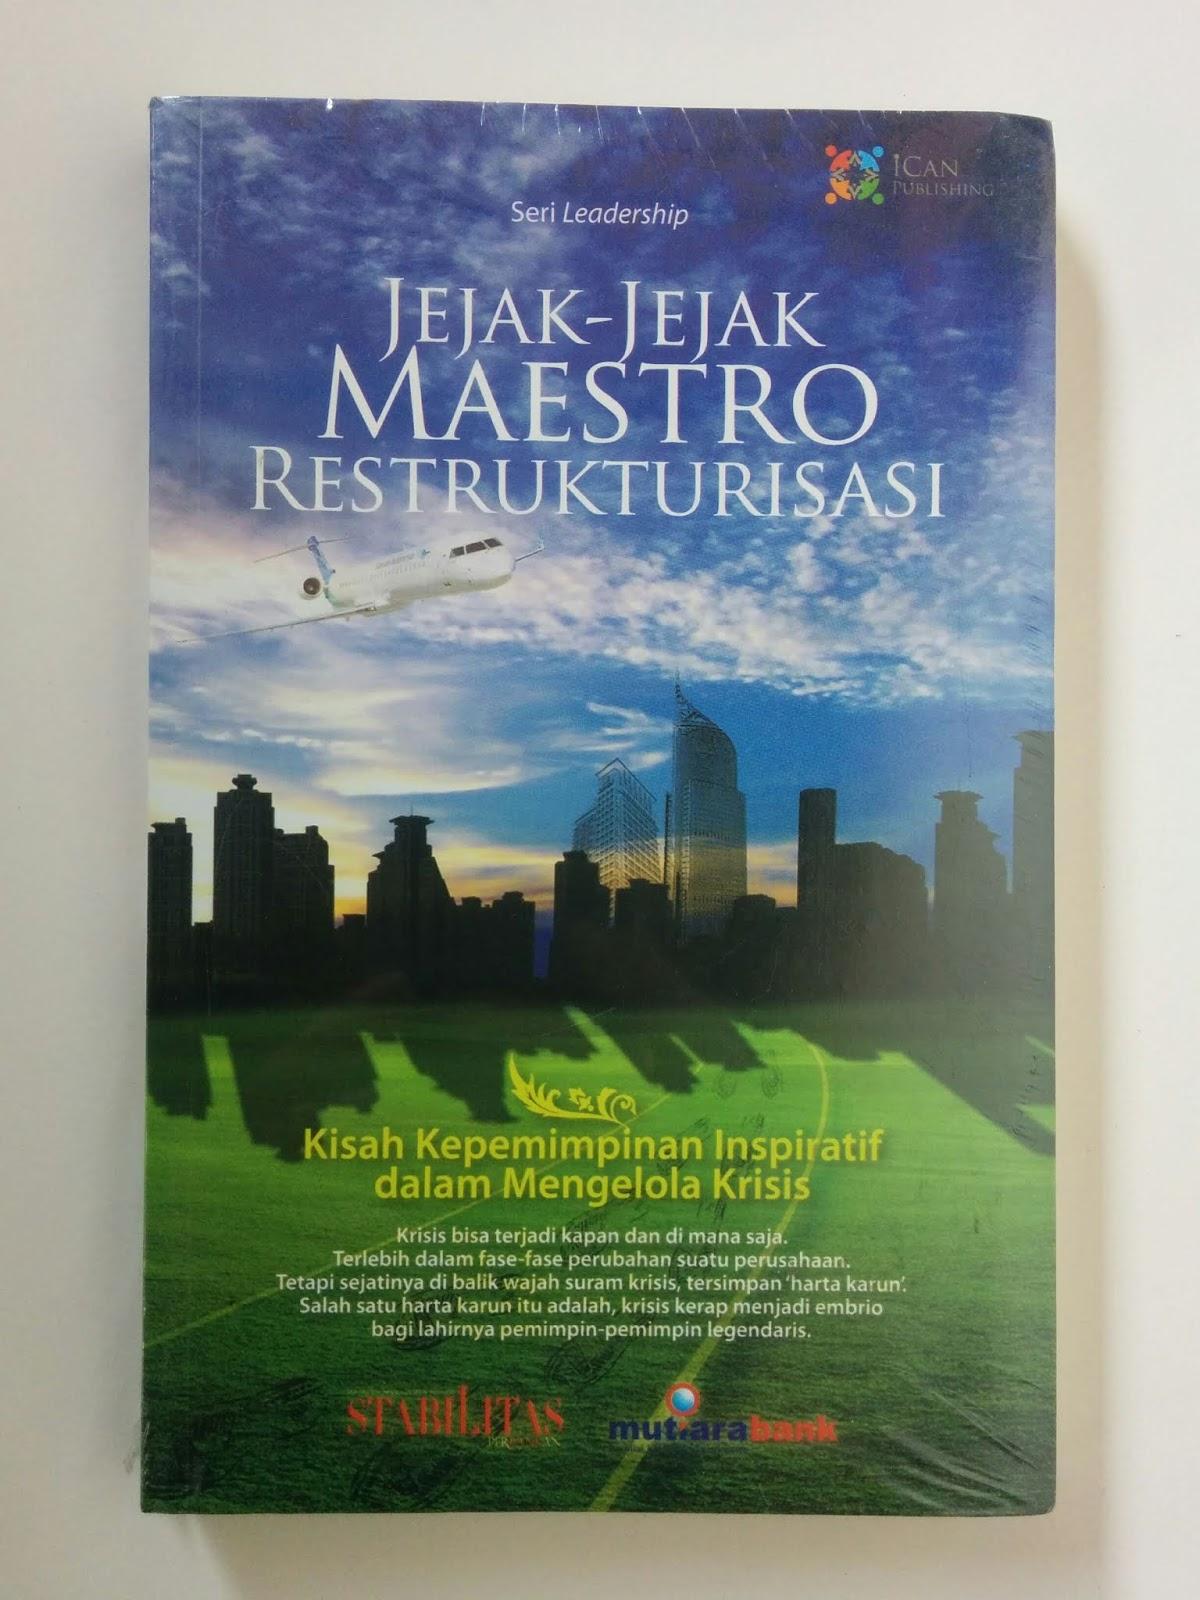 Buku Seri Leadership Prayogo P. Harto